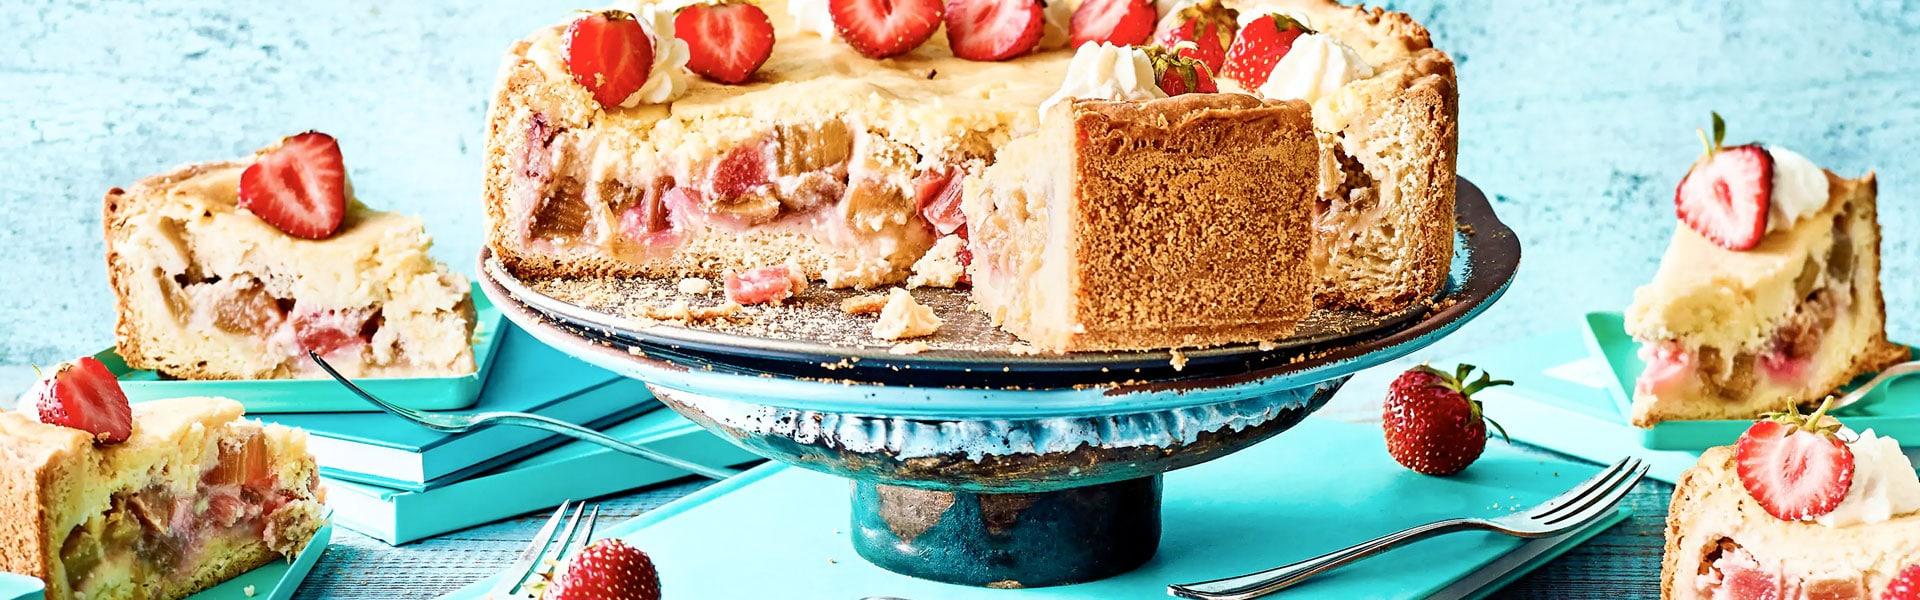 Rhabarber-Grießkuchen